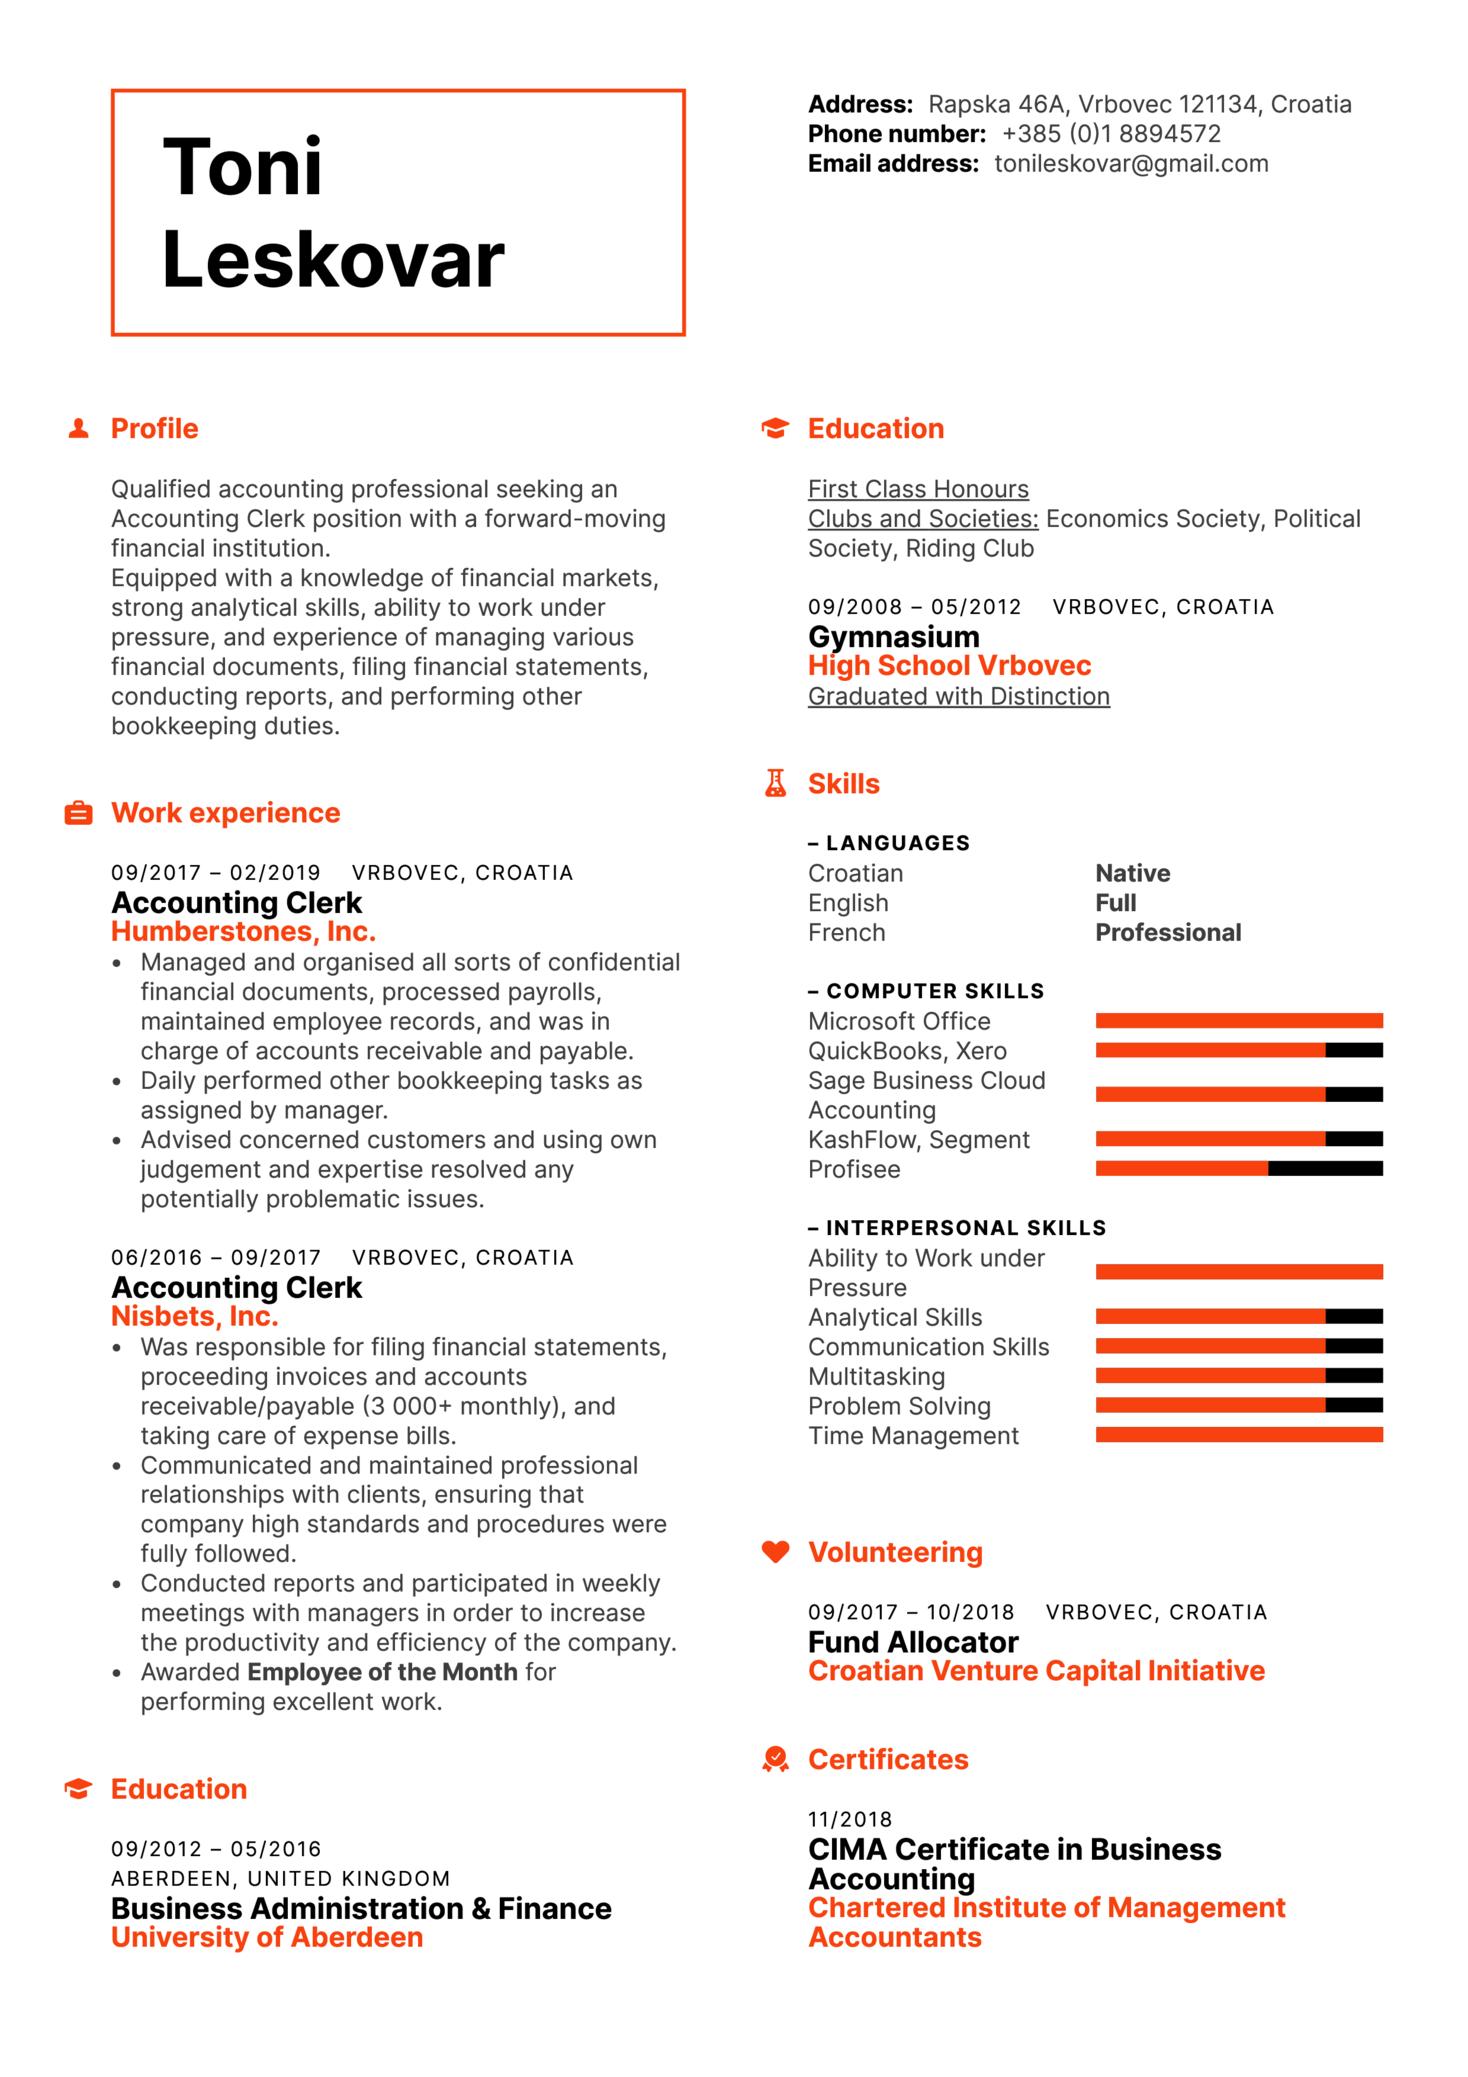 Accounting Clerk Resume Example (Parte 1)